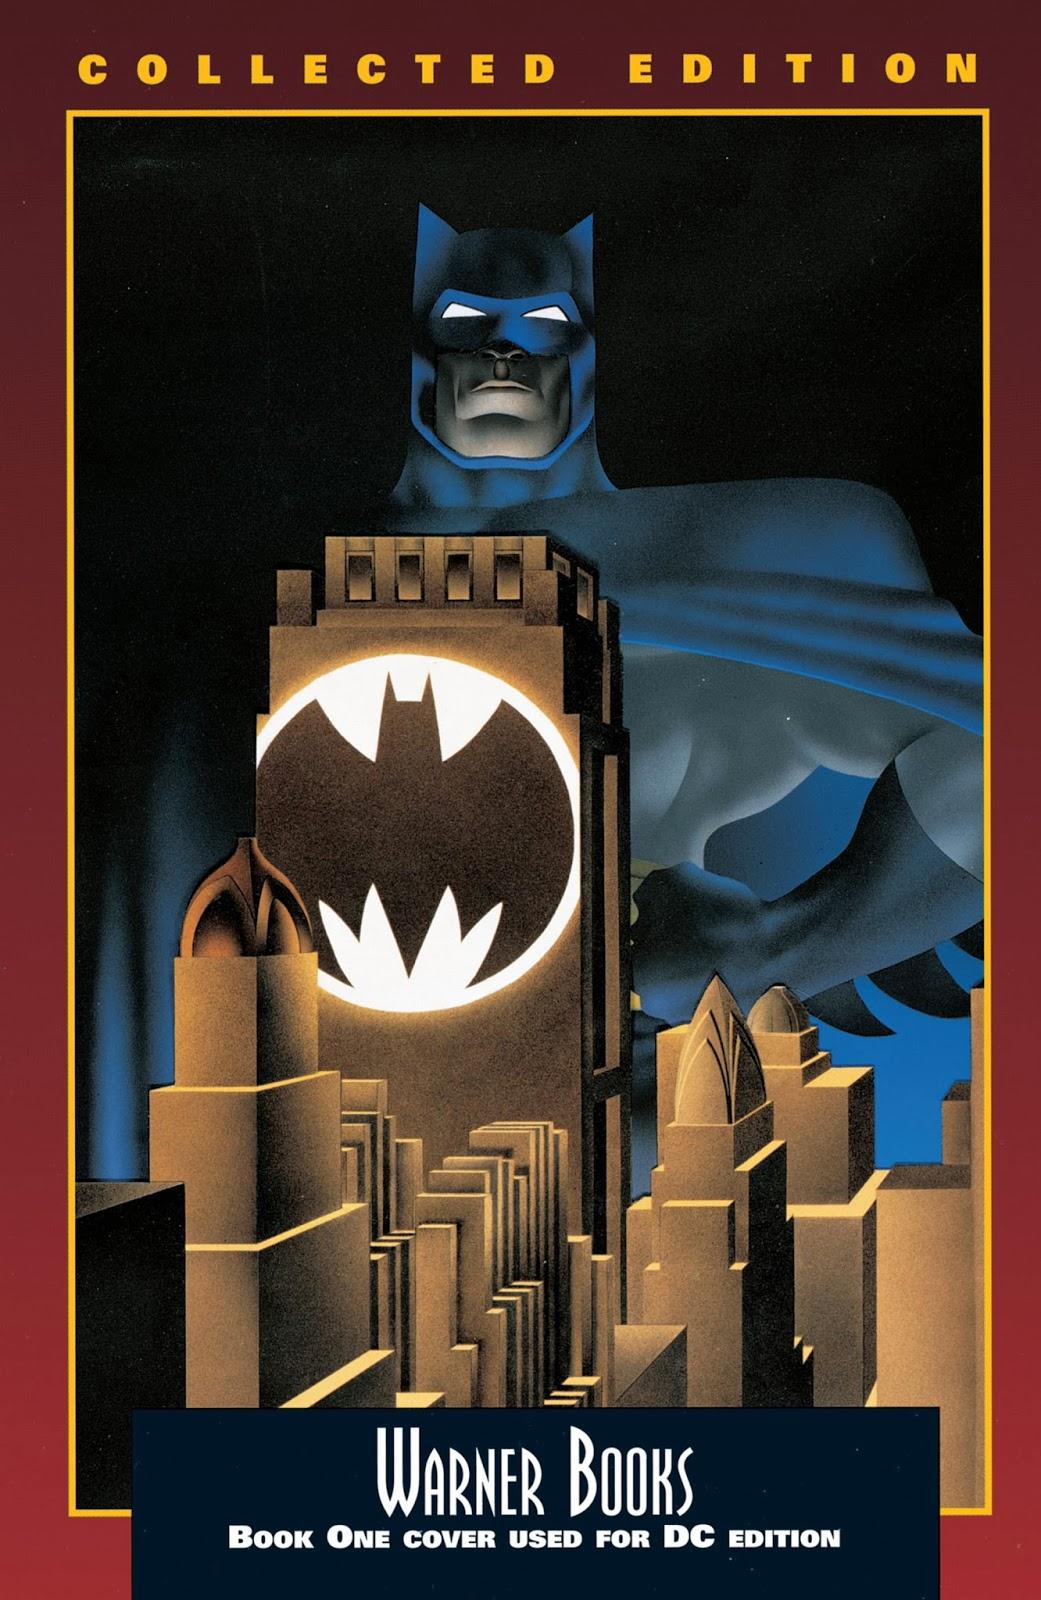 Coleccionista de Imagenes: Frank Miller, Portadas para Batman: The ...